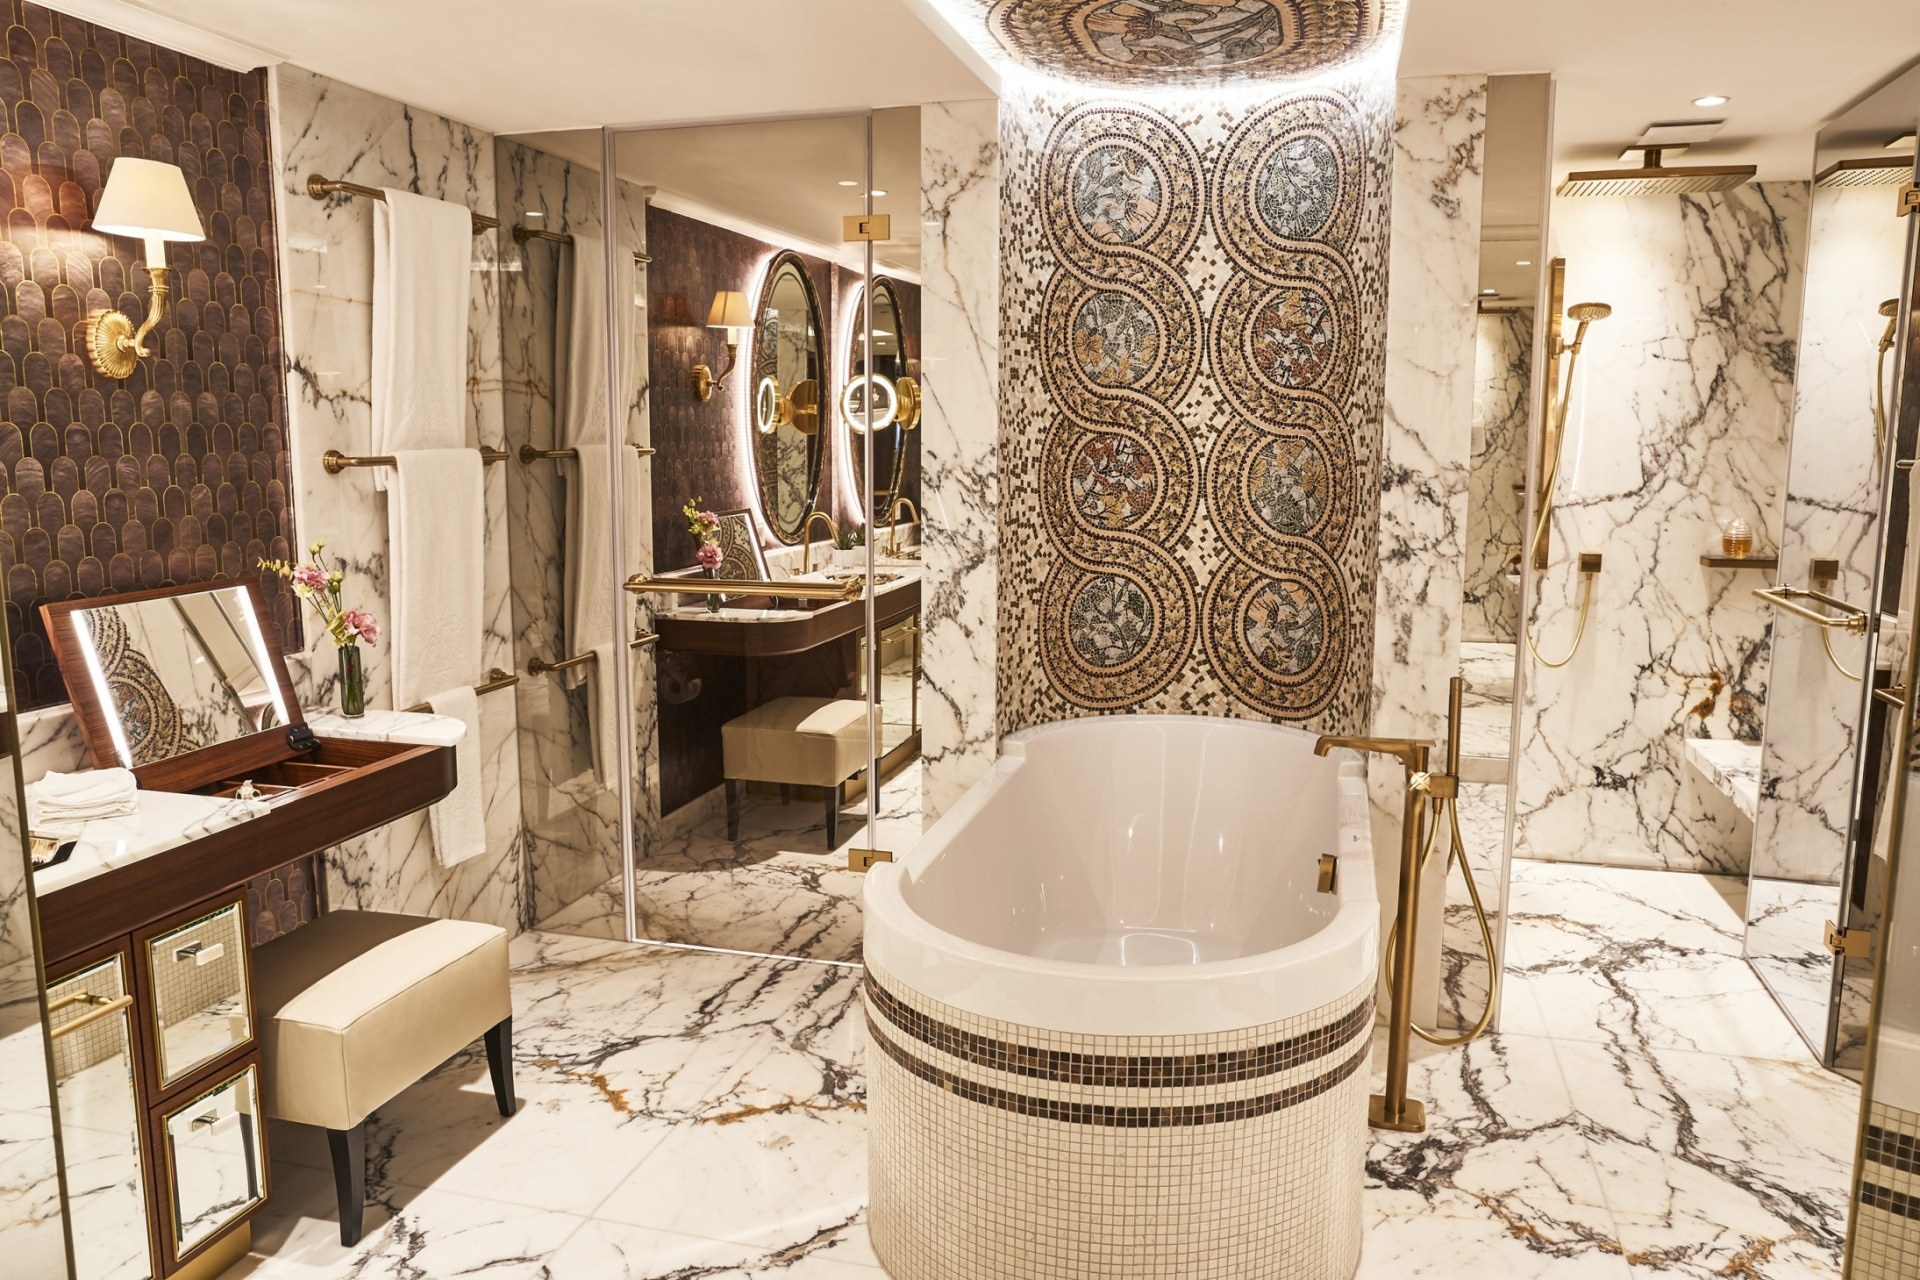 Badezimmer der Maximilian Suite